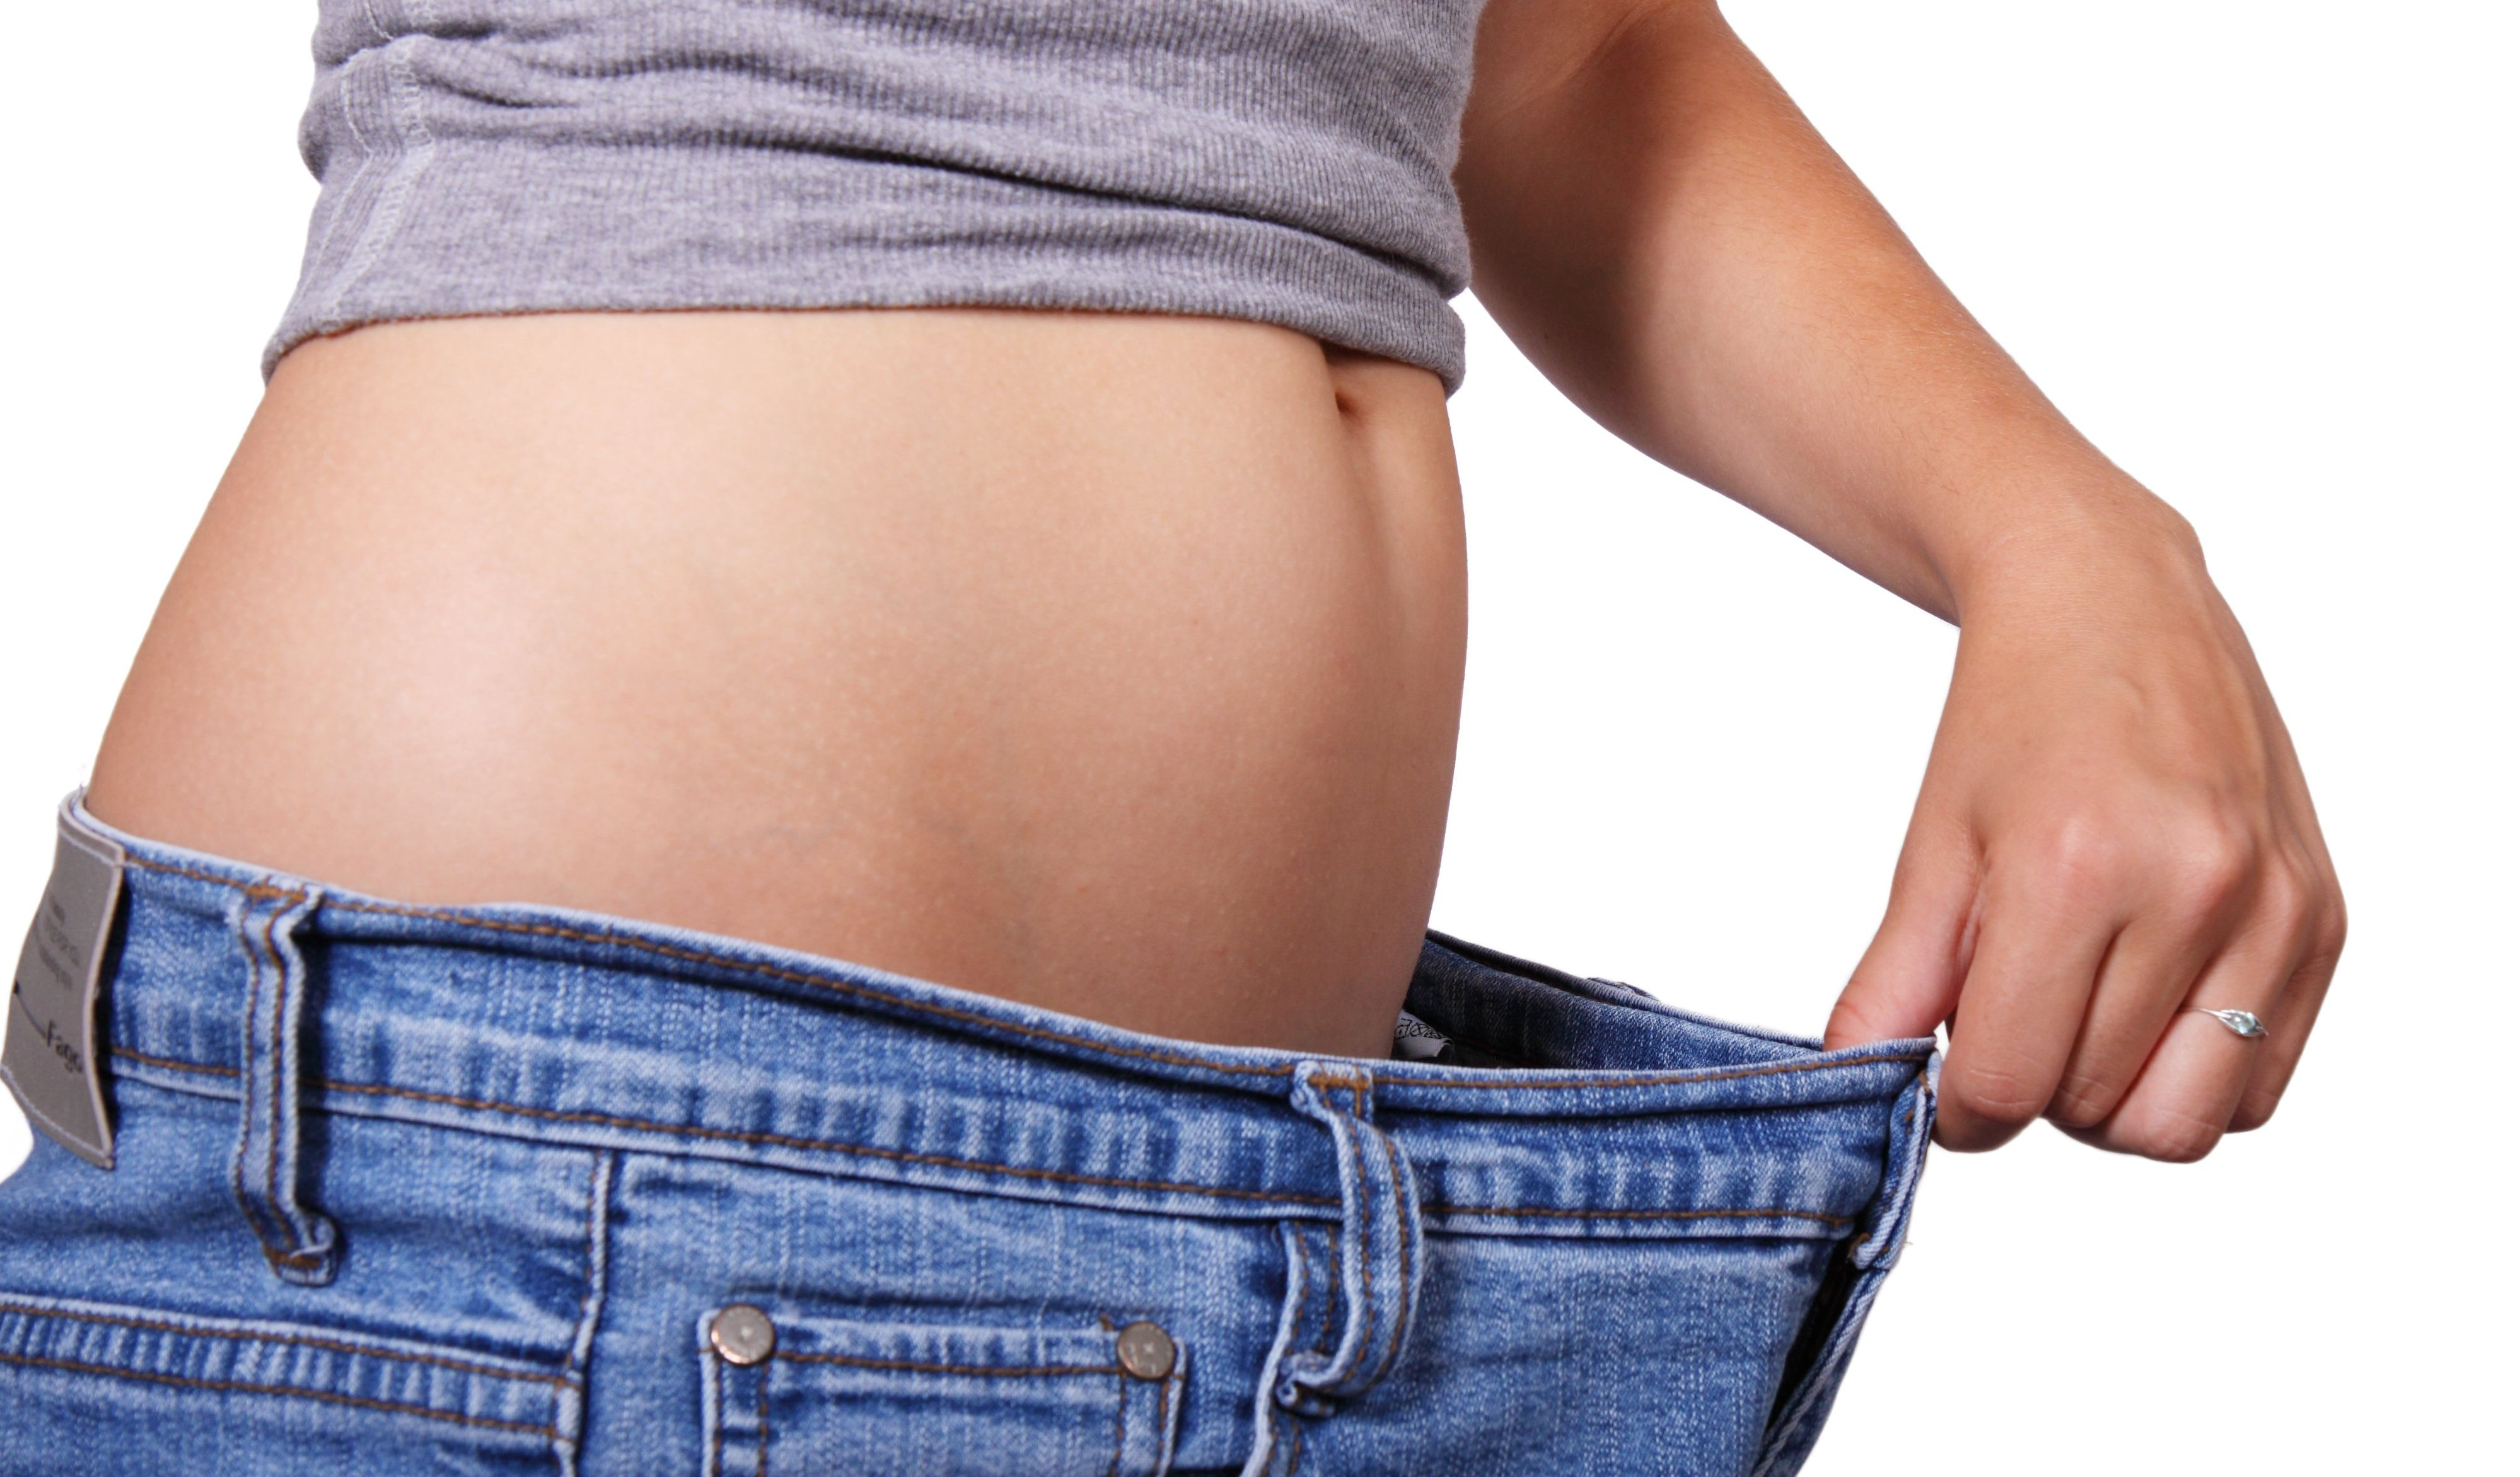 Pierdere in greutate – cand ar trebui sa iti faci griji